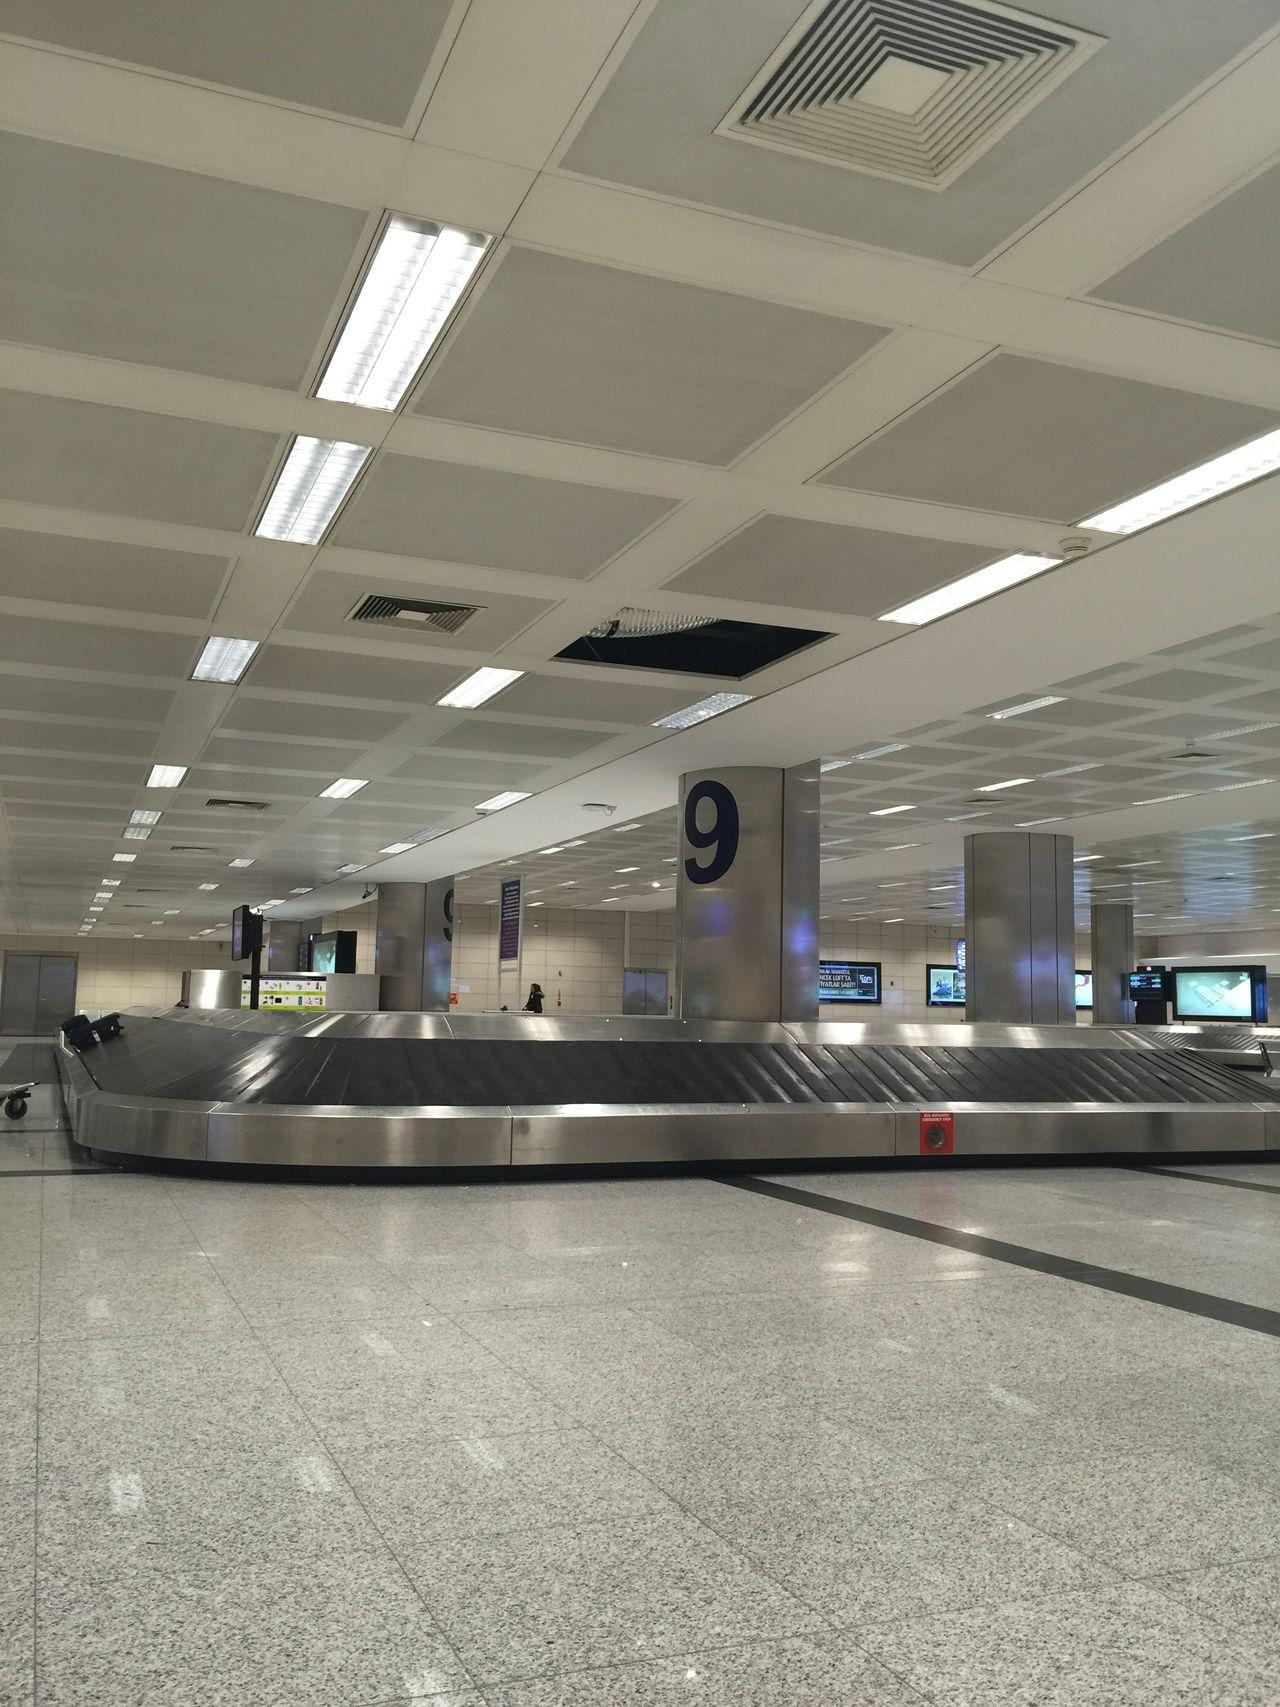 Buggage claim at the airport Airport Baggage Baggage Claim Lagguage